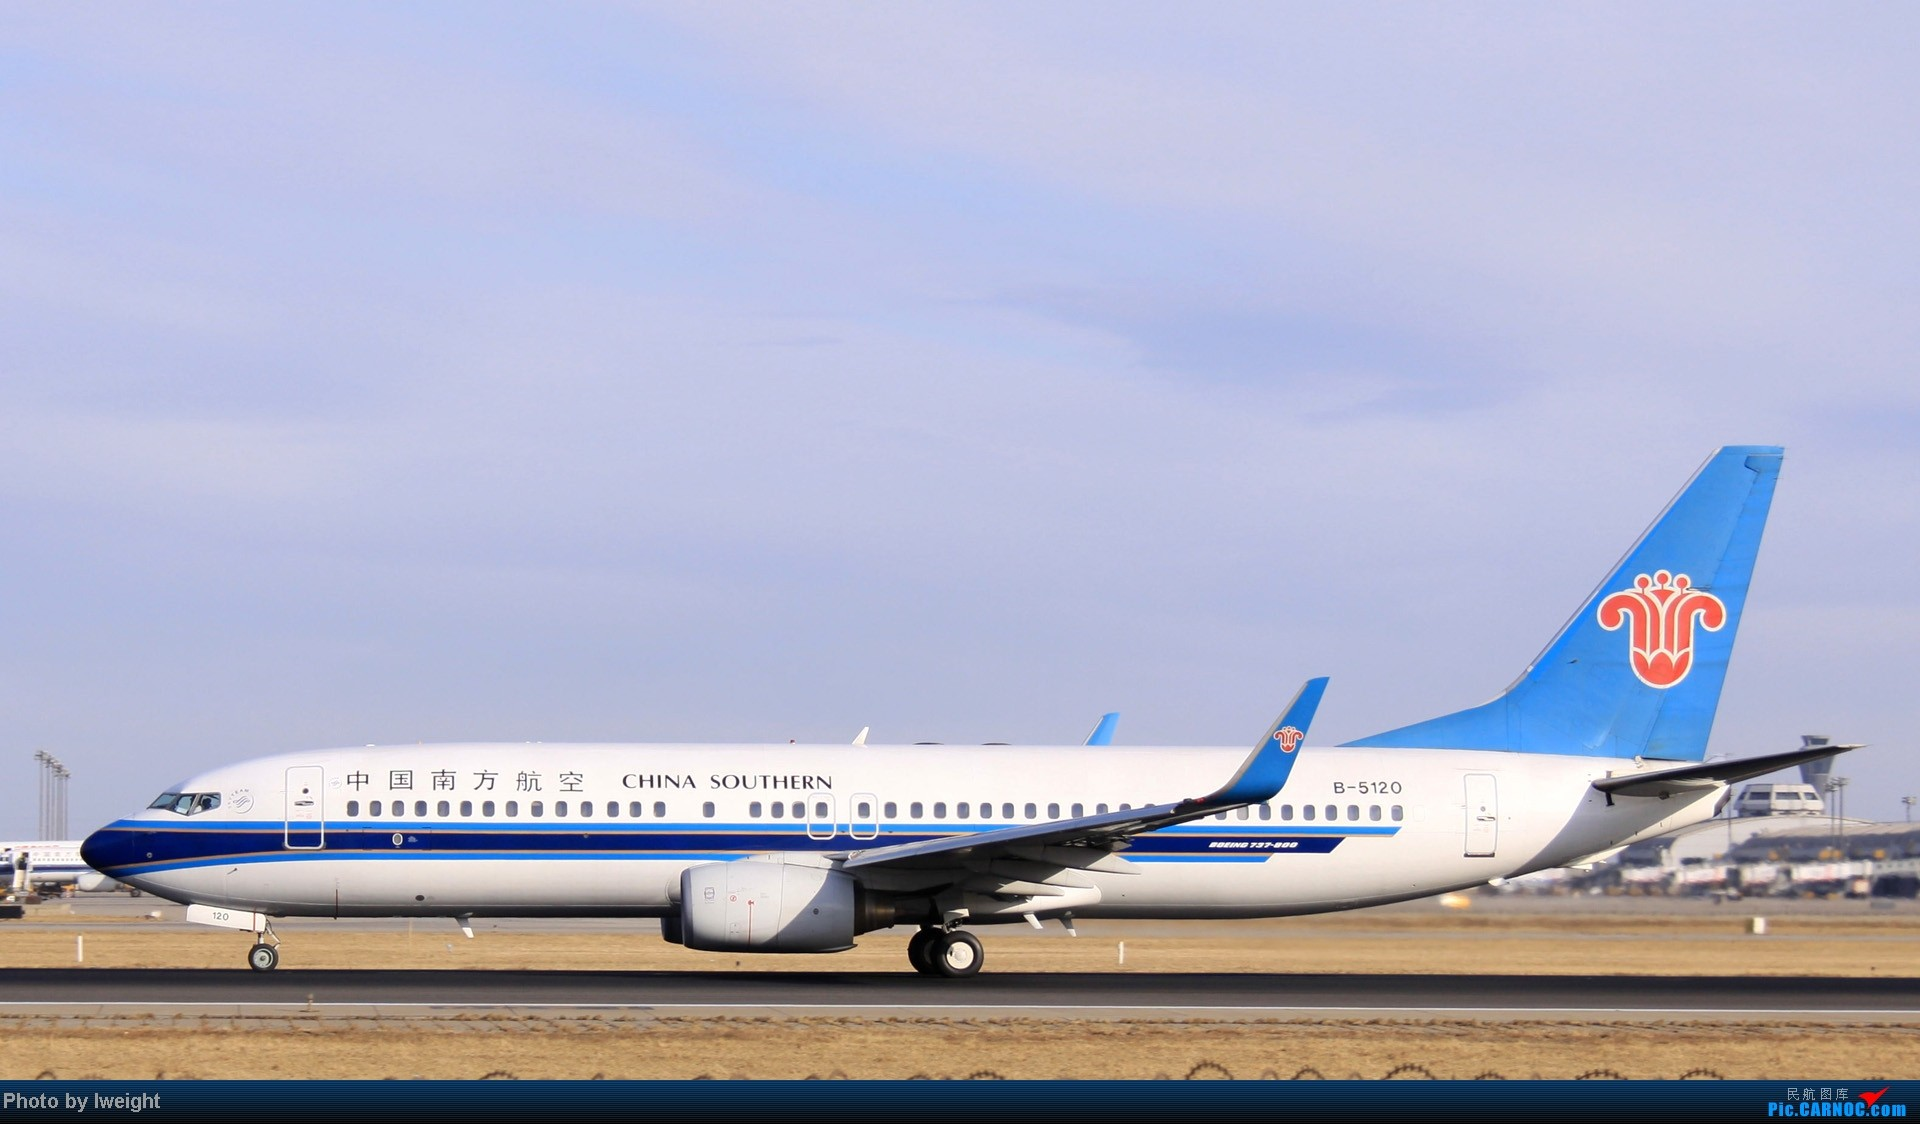 Re:[原创]今天下午瞎拍两个小时的杂图 BOEING 737-800 B-5120 中国北京首都机场